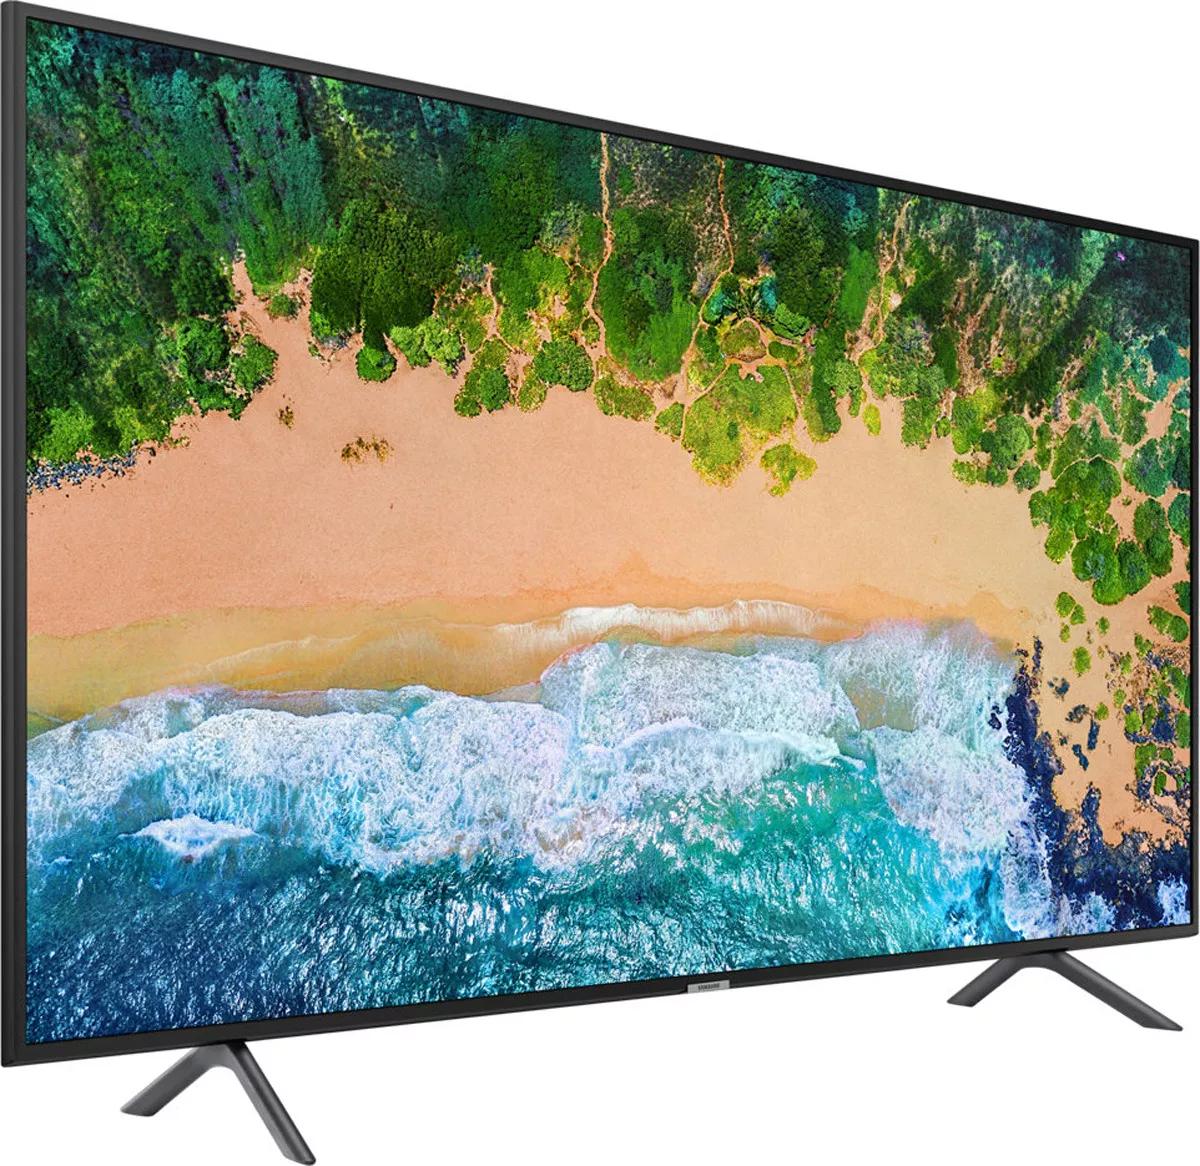 Televizor Samsung LED UE55NU7100UXRU 0C0H3LDK900561 - 2